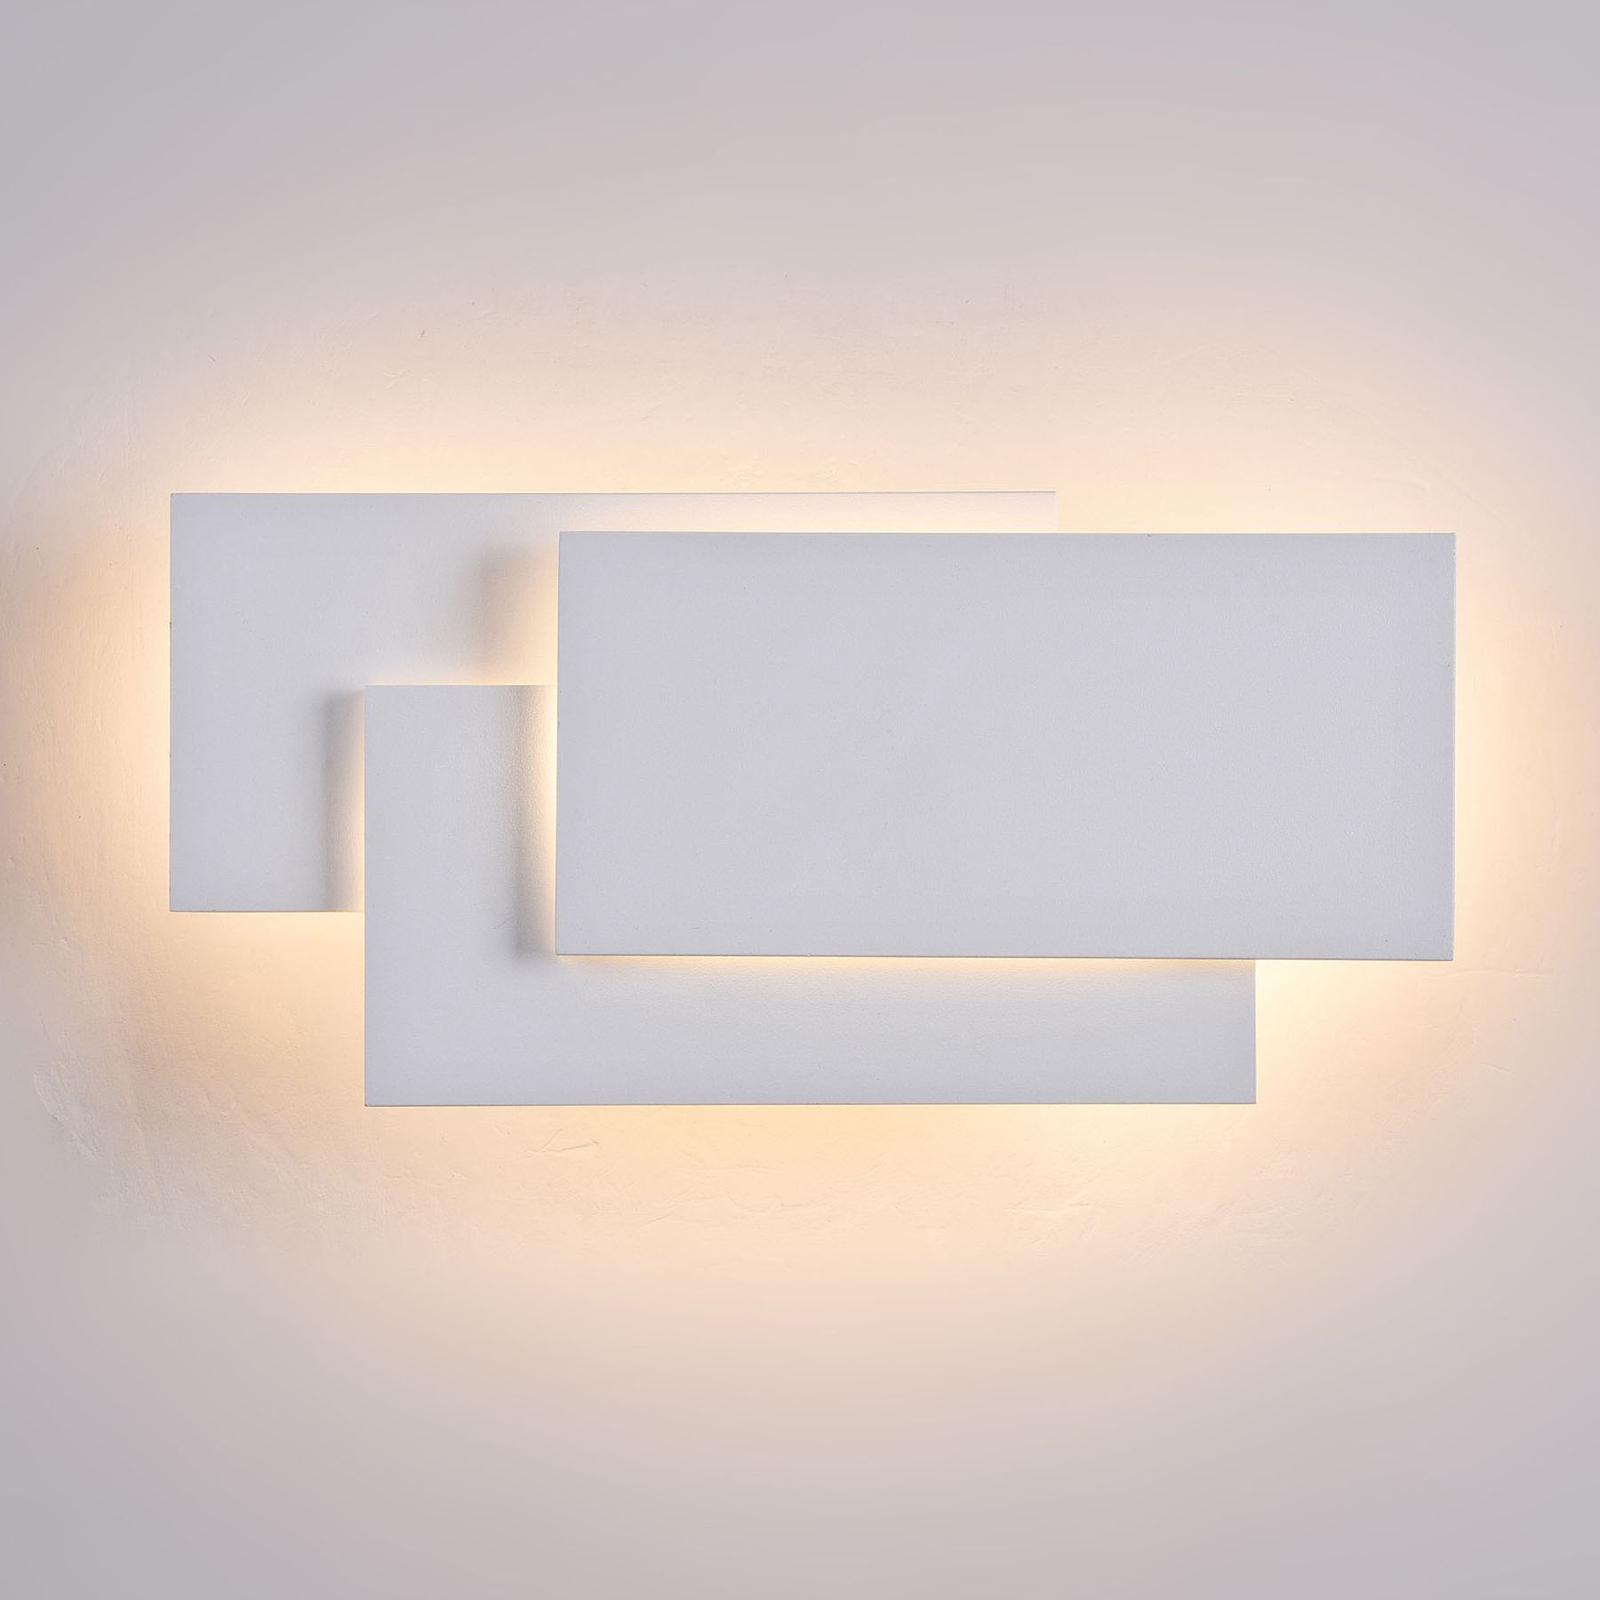 Applique LED Trame, rectangulaire